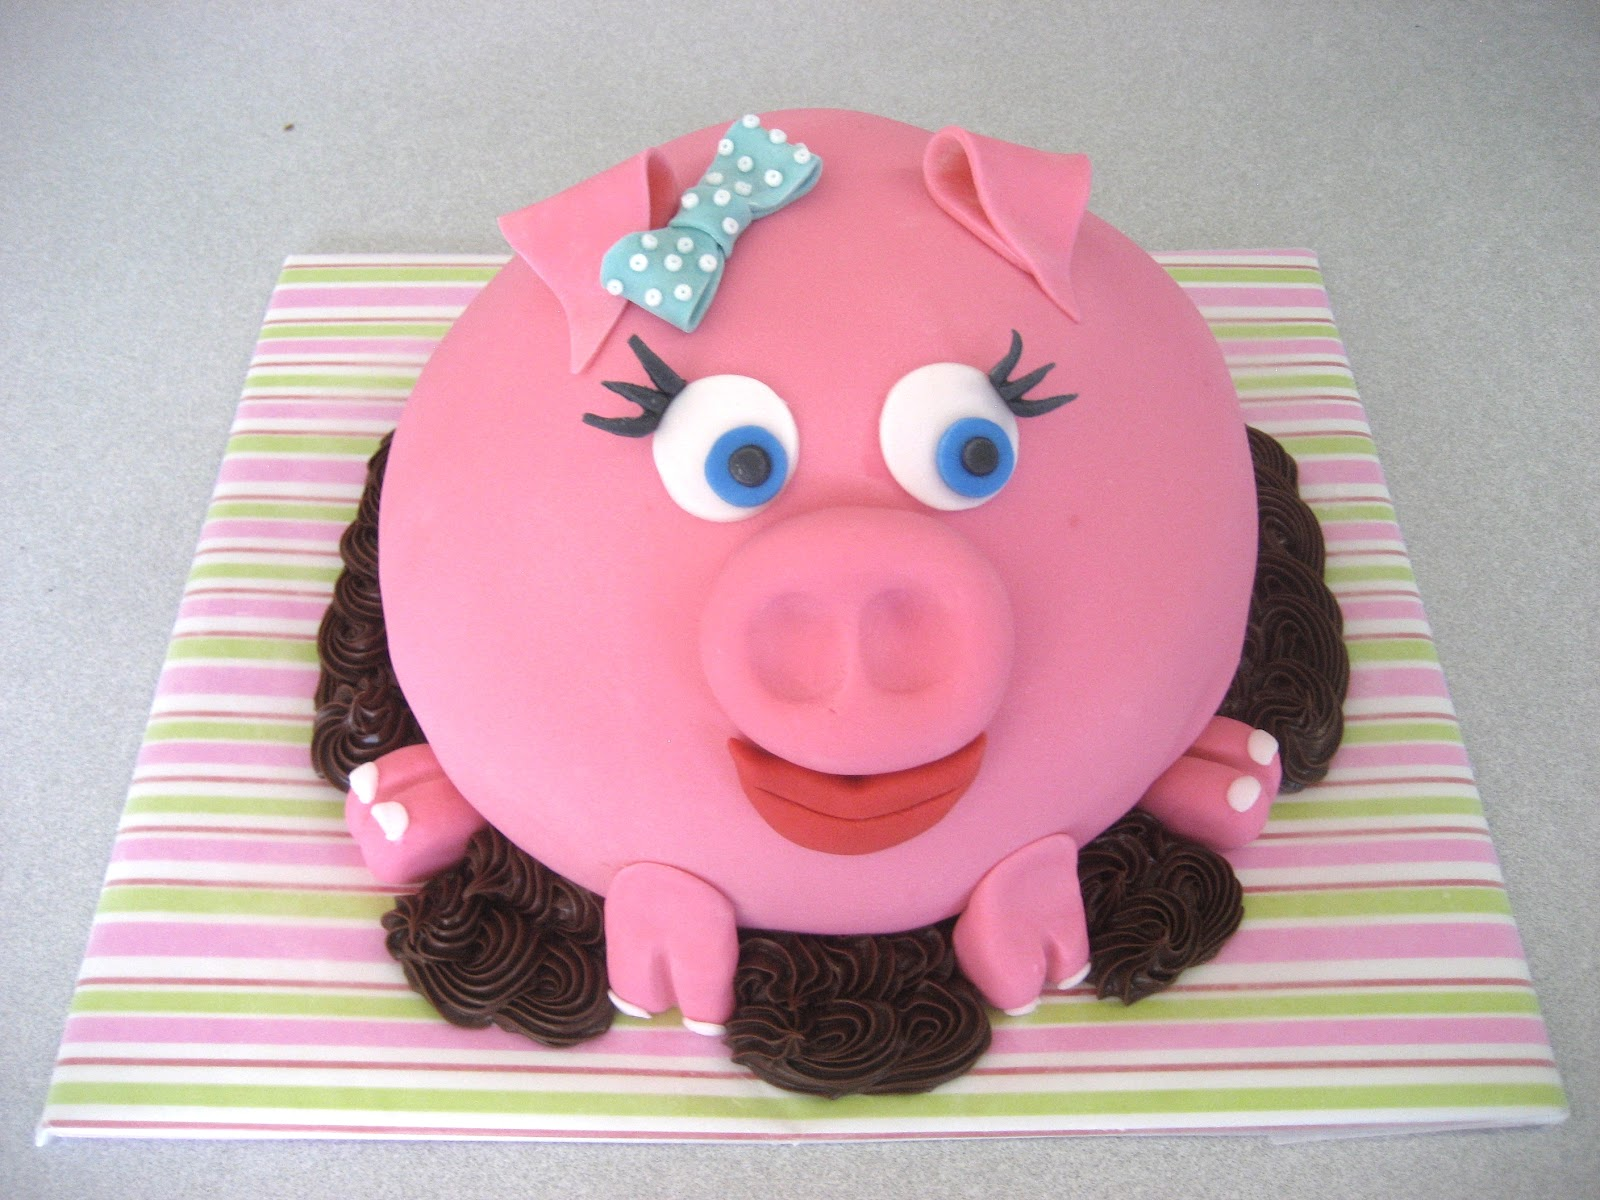 Pleasing 9 Piggy Birthday Cakes Photo Pig Birthday Cake Pig Birthday Funny Birthday Cards Online Inifodamsfinfo